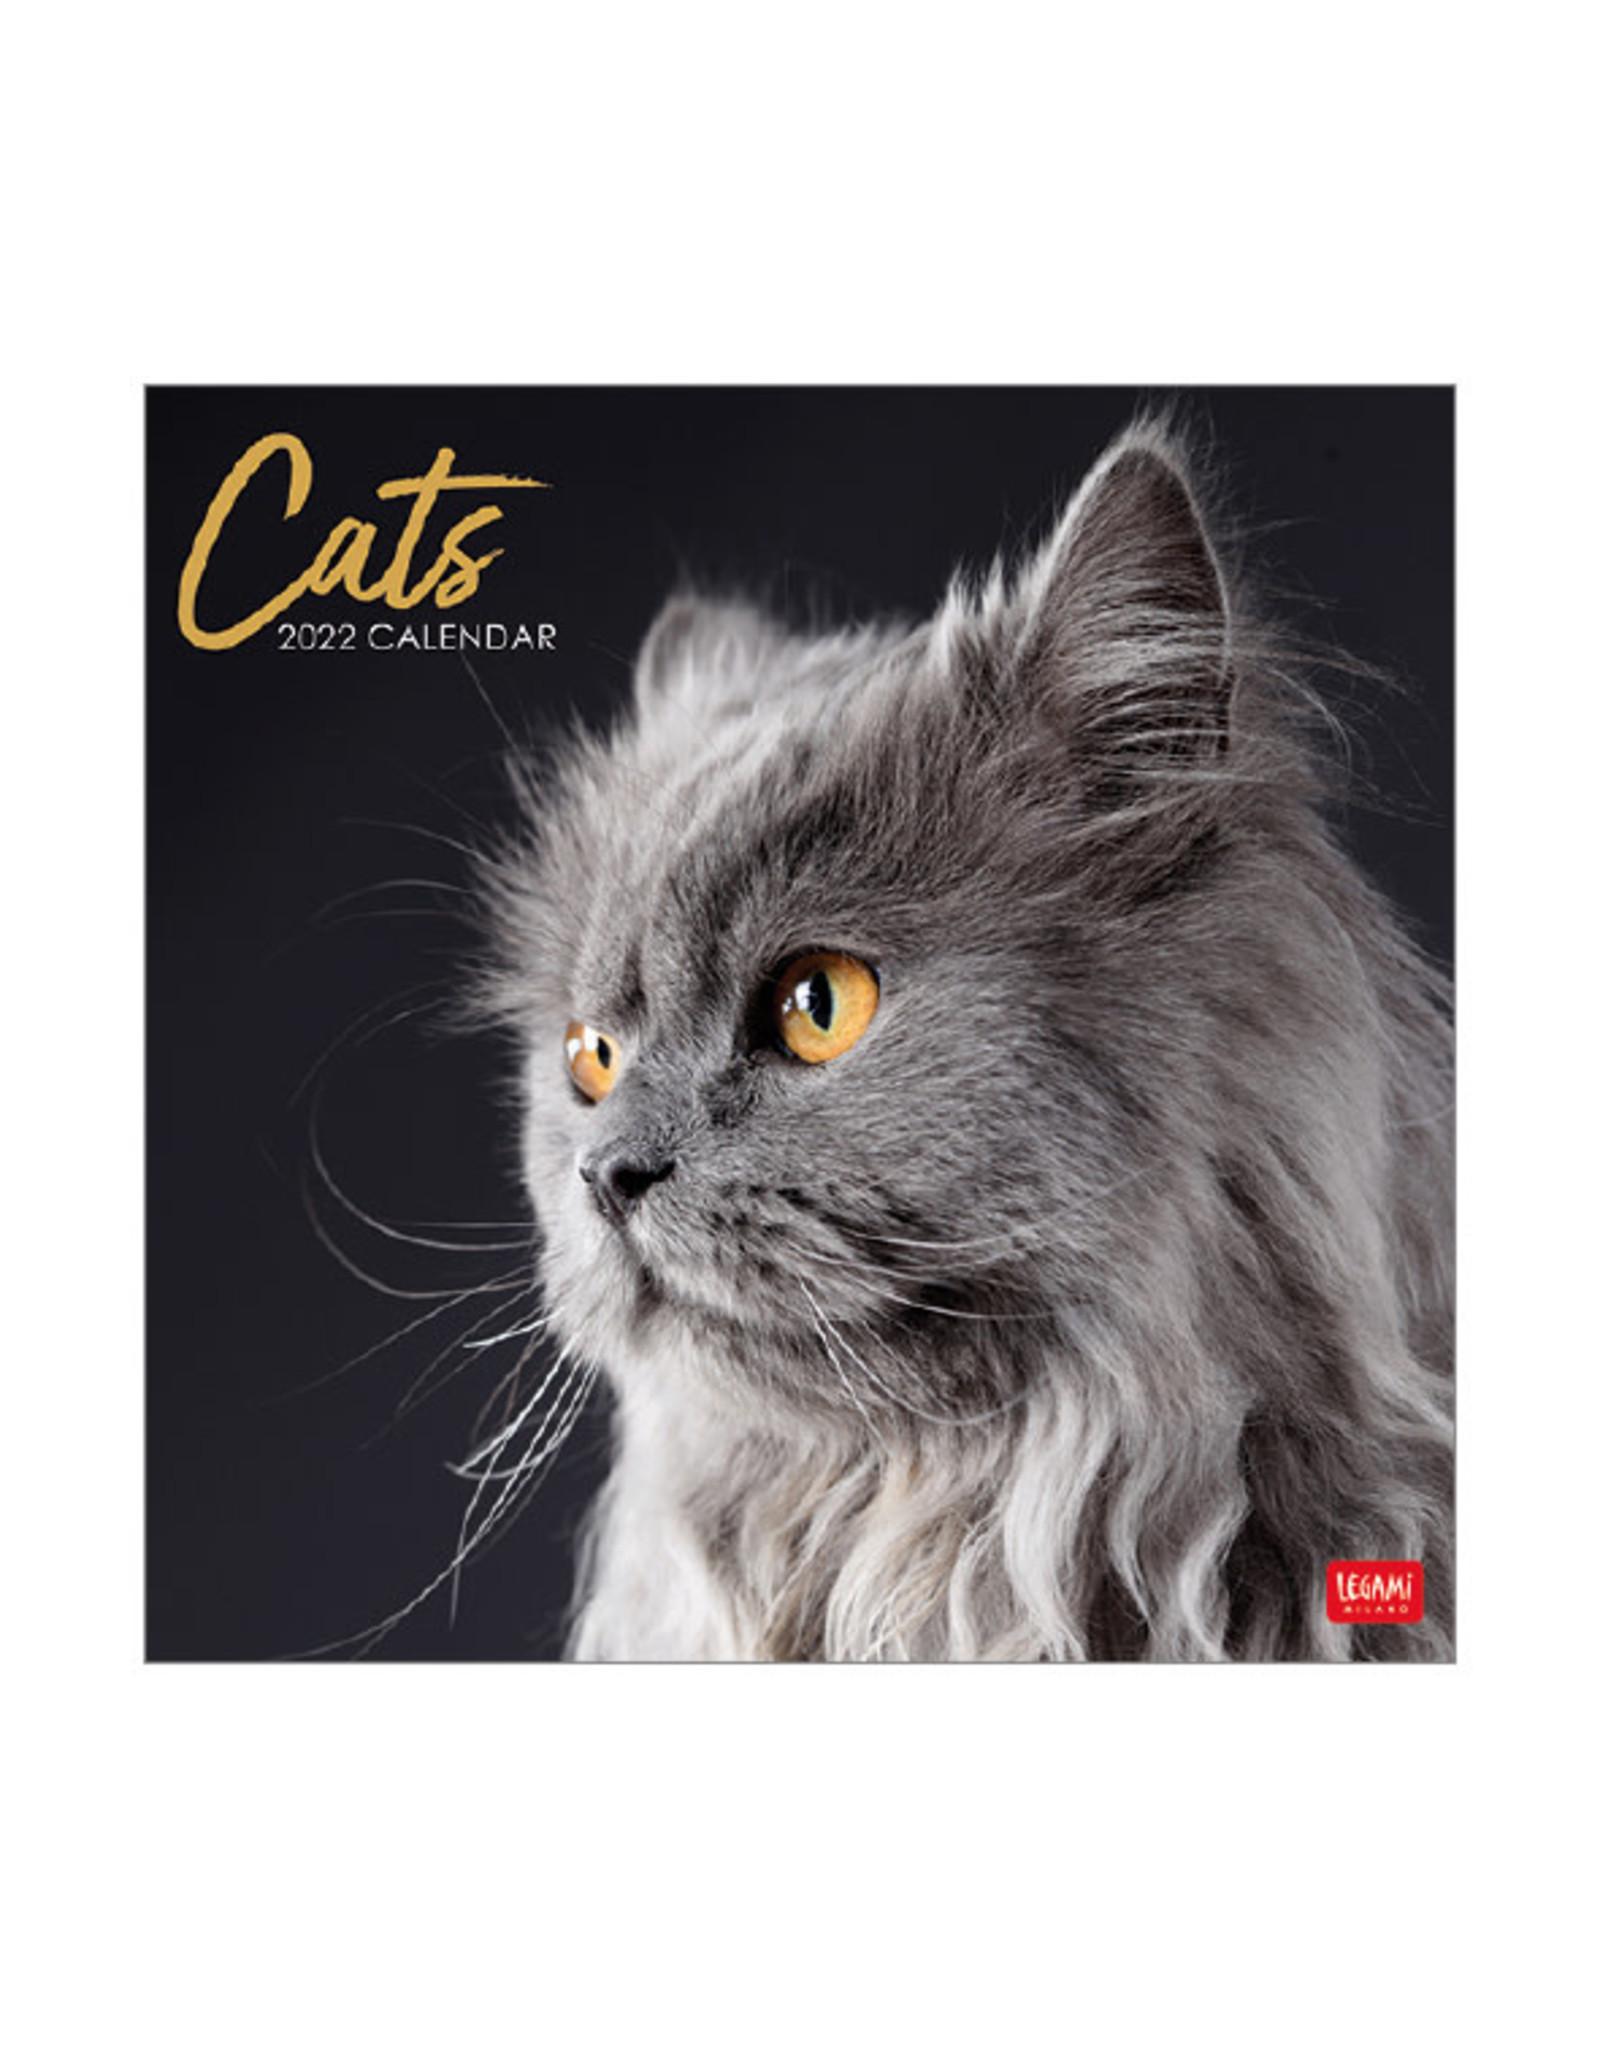 Legami calendar 2022 with cats